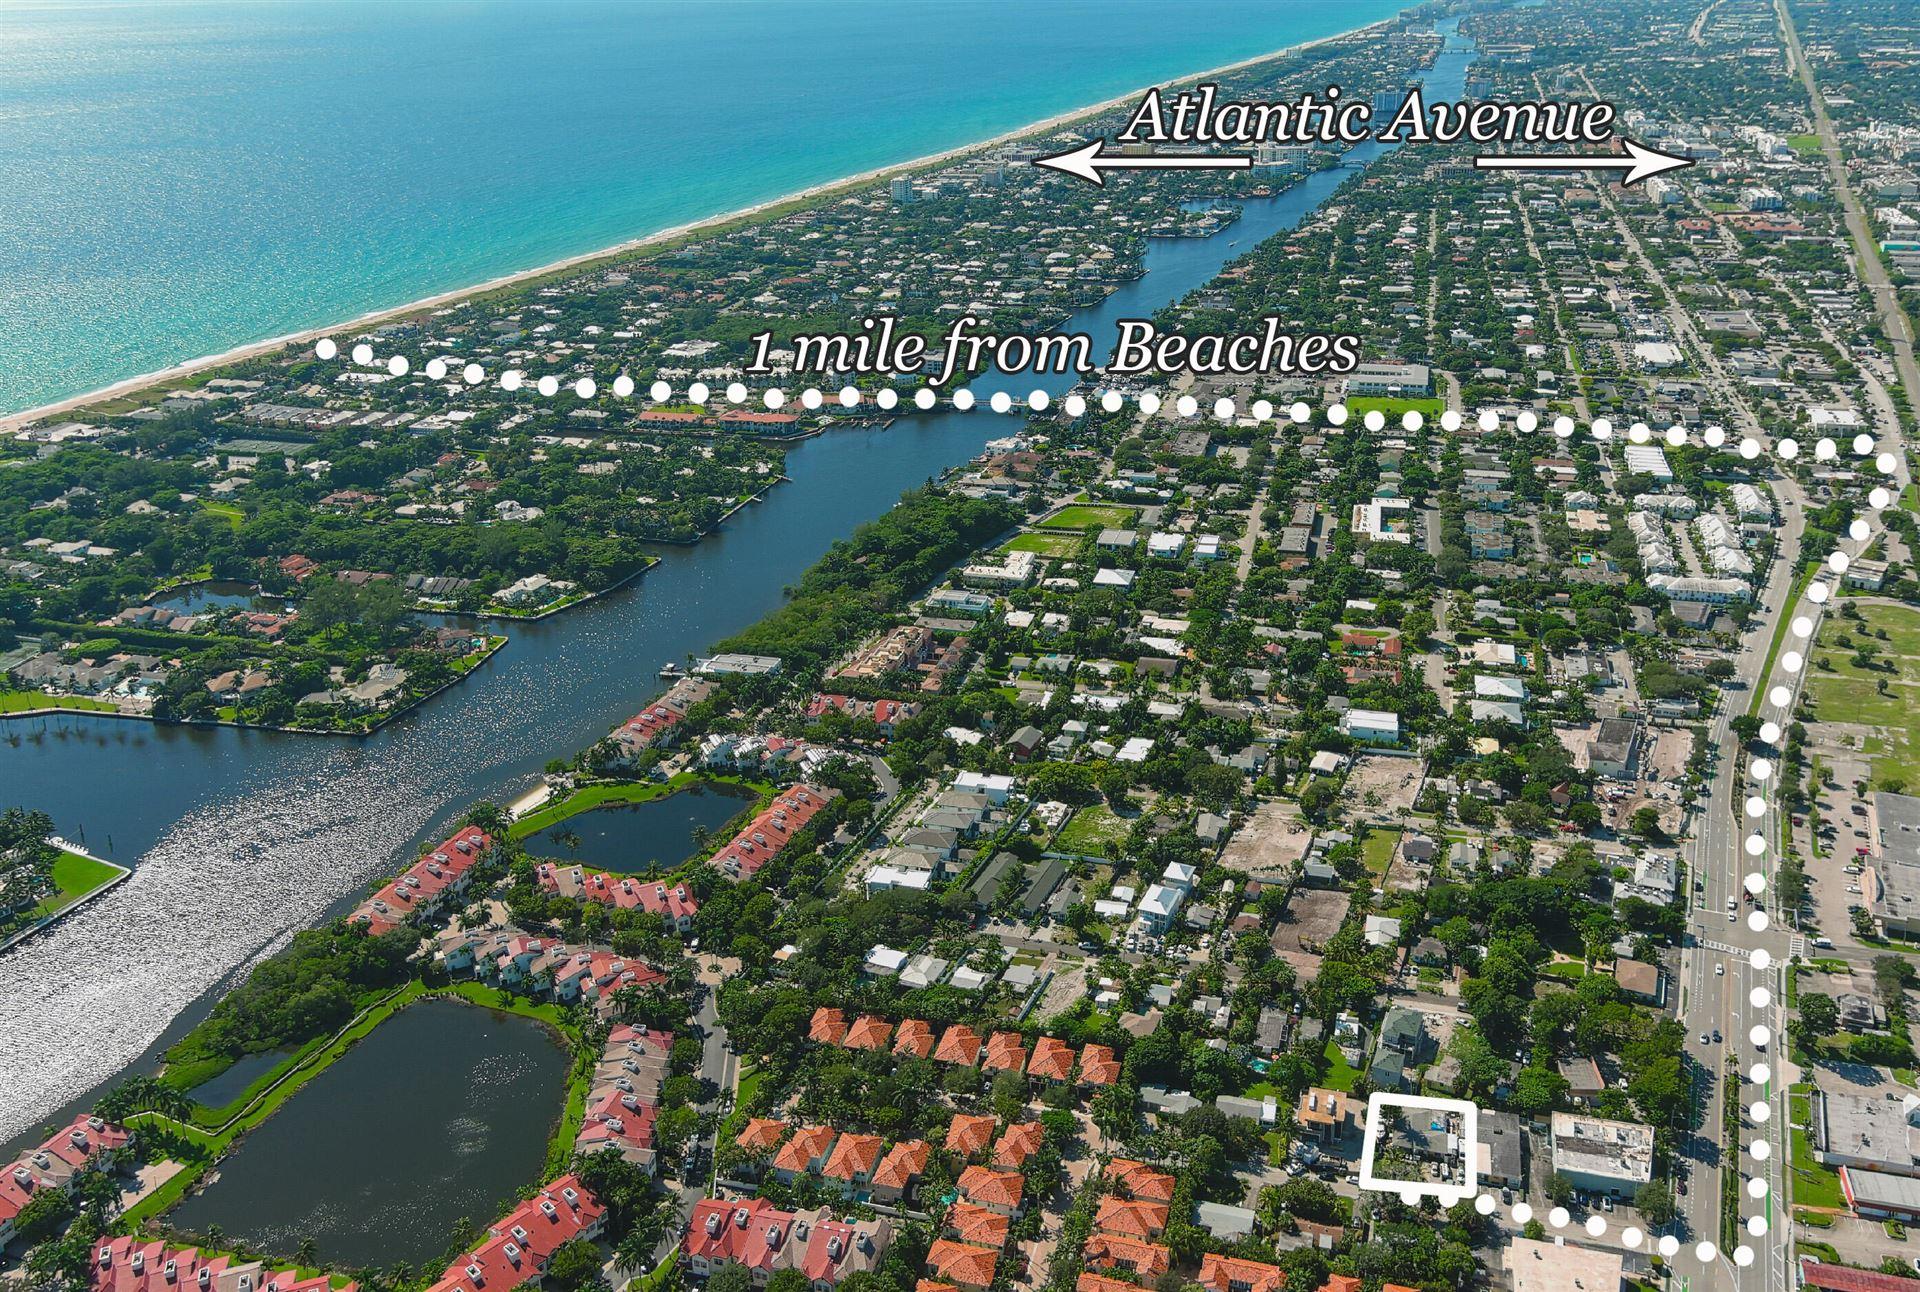 6 Eastview Avenue, Delray Beach, FL 33483 - MLS#: RX-10749184